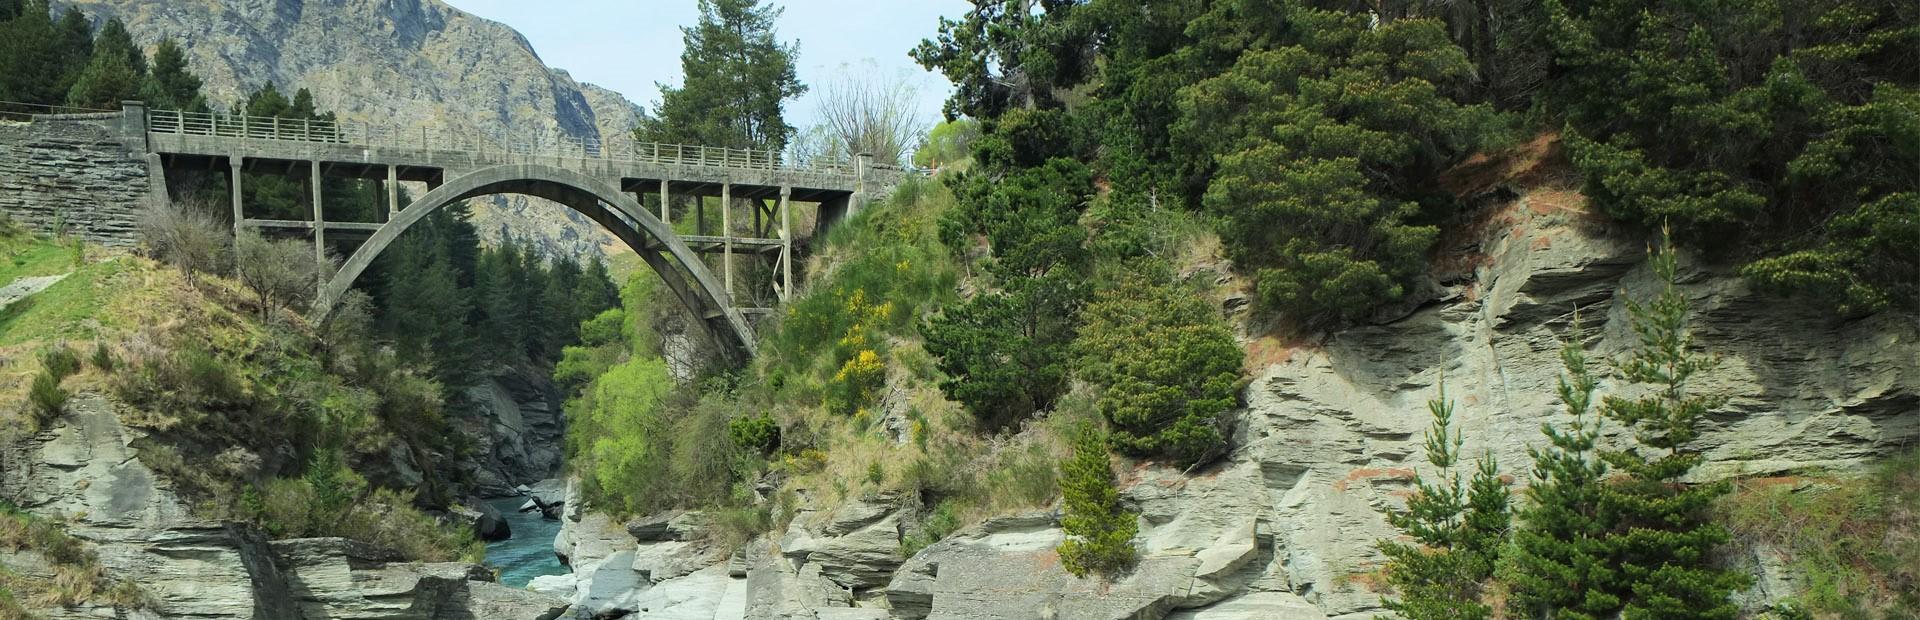 Slider_Edith_Cavill_Bridge